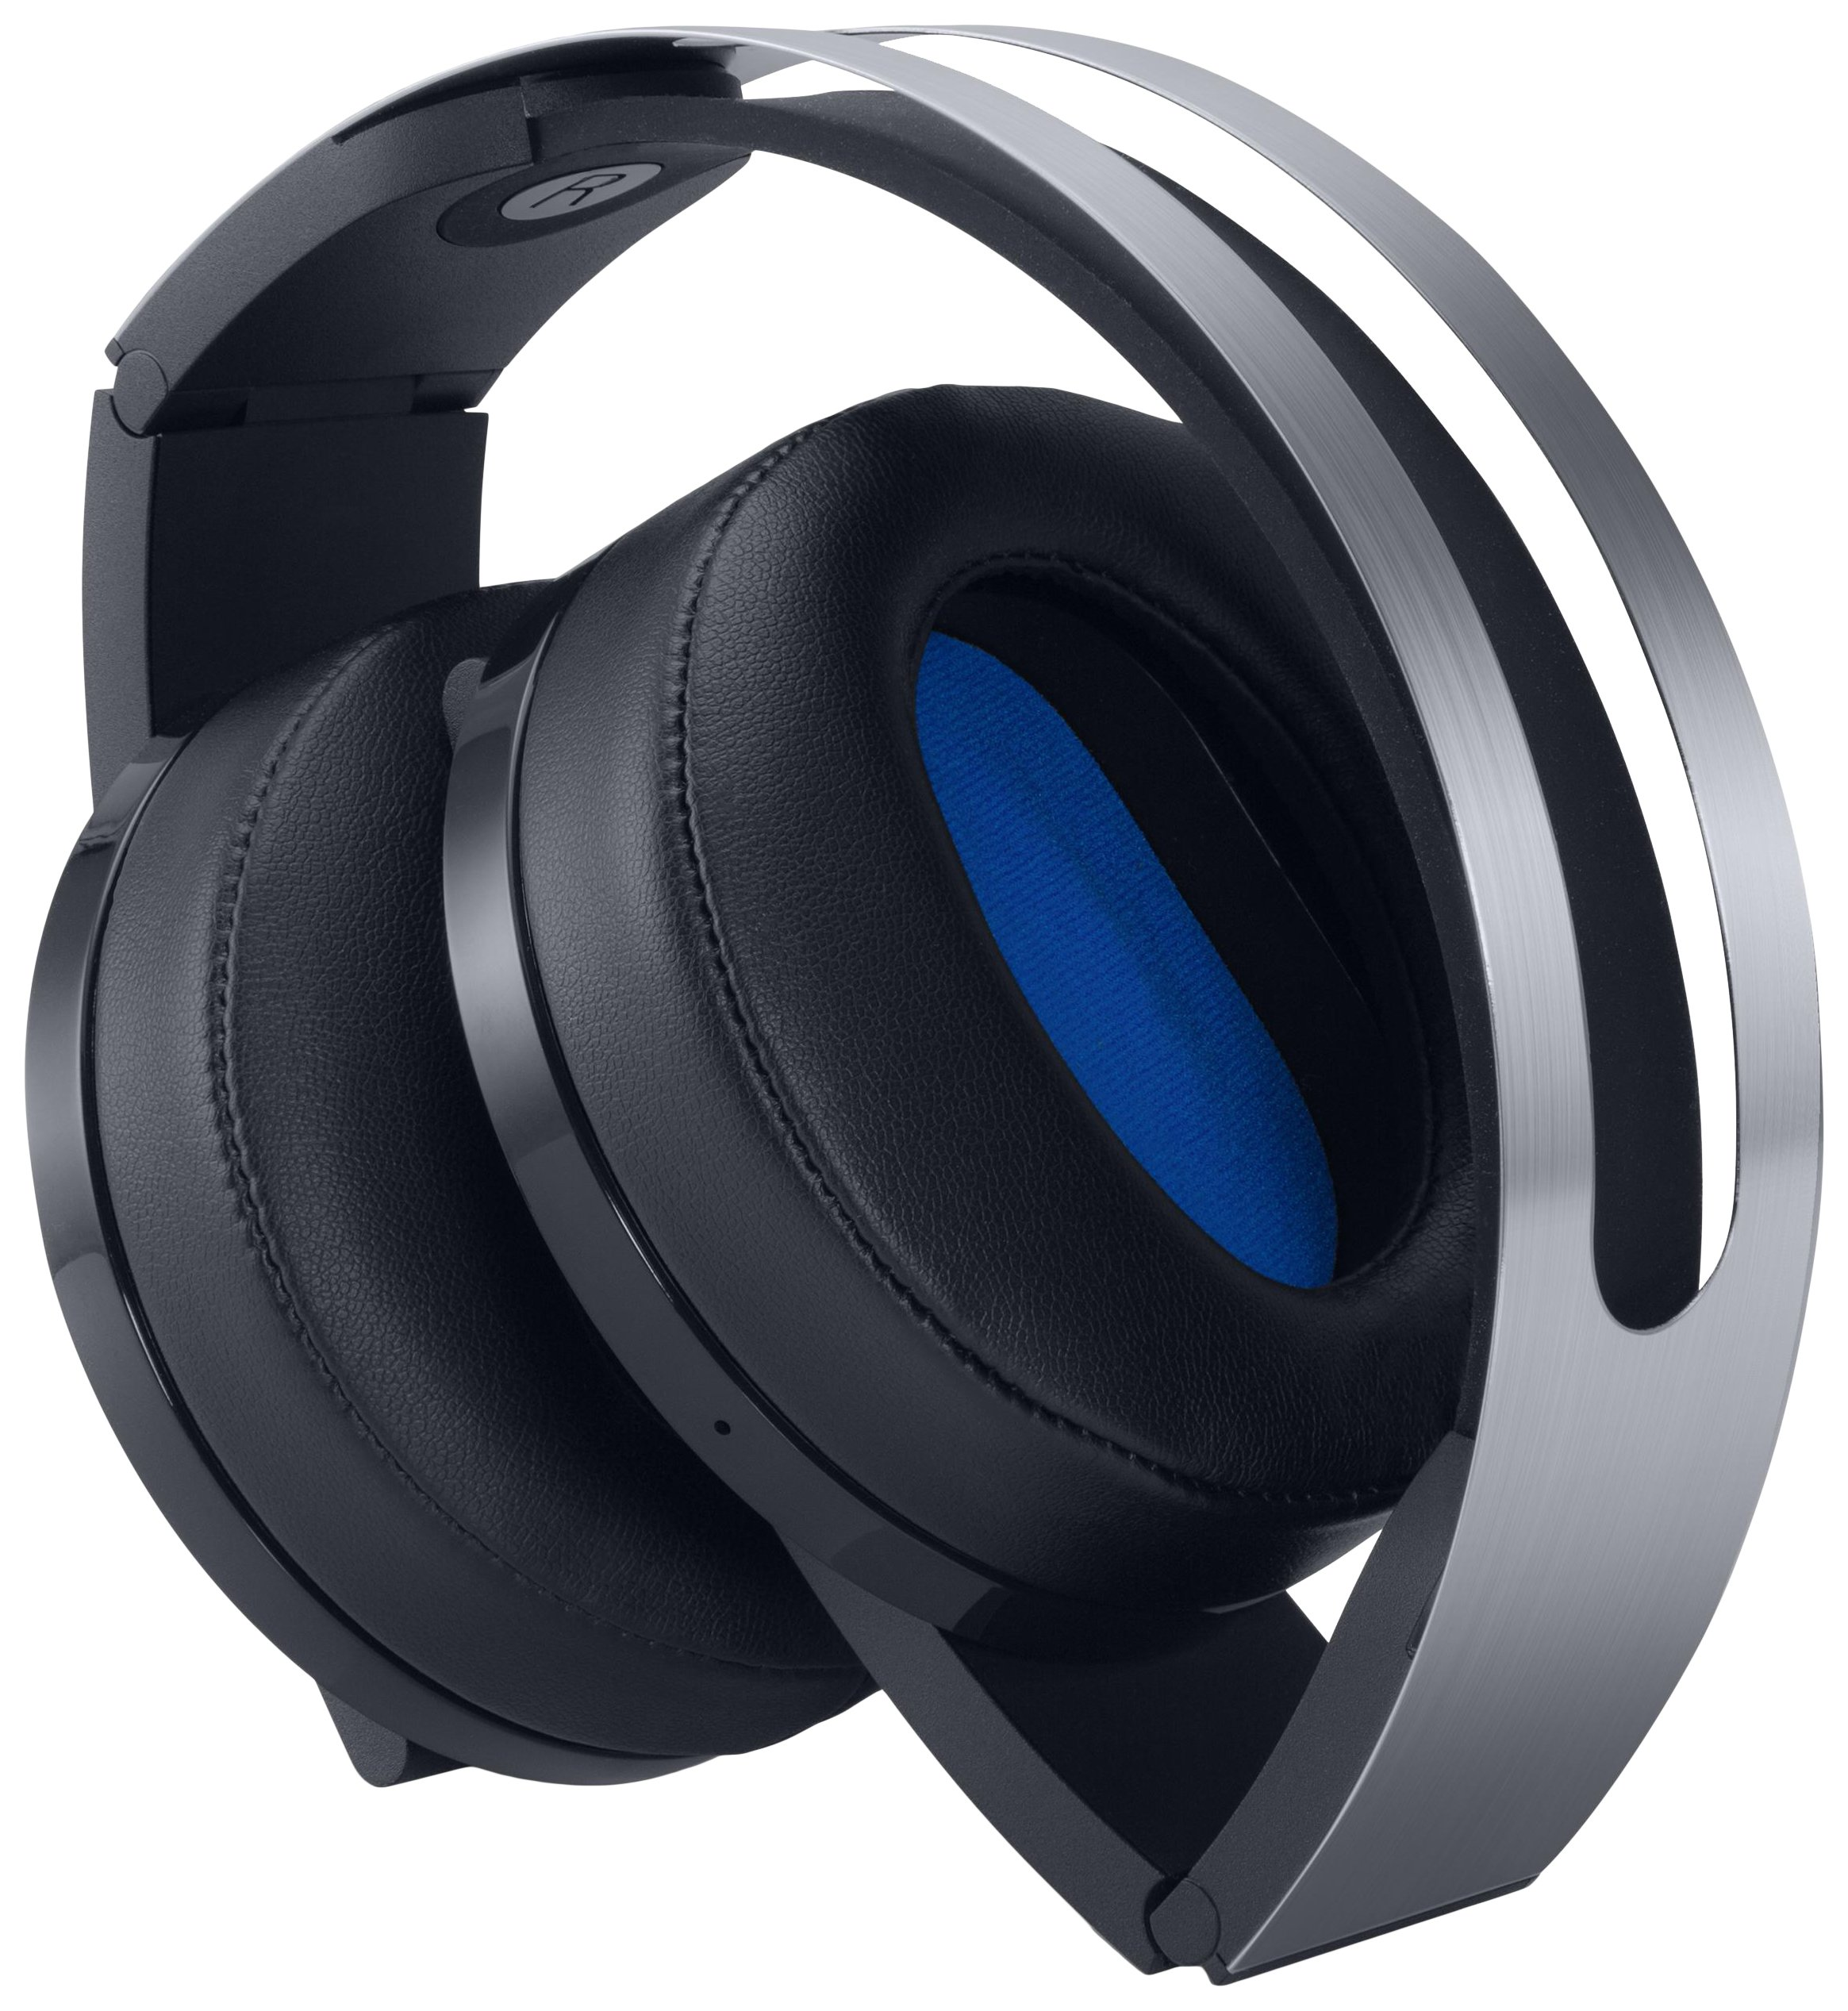 PlayStation Platinum Wireless Headset by Sony